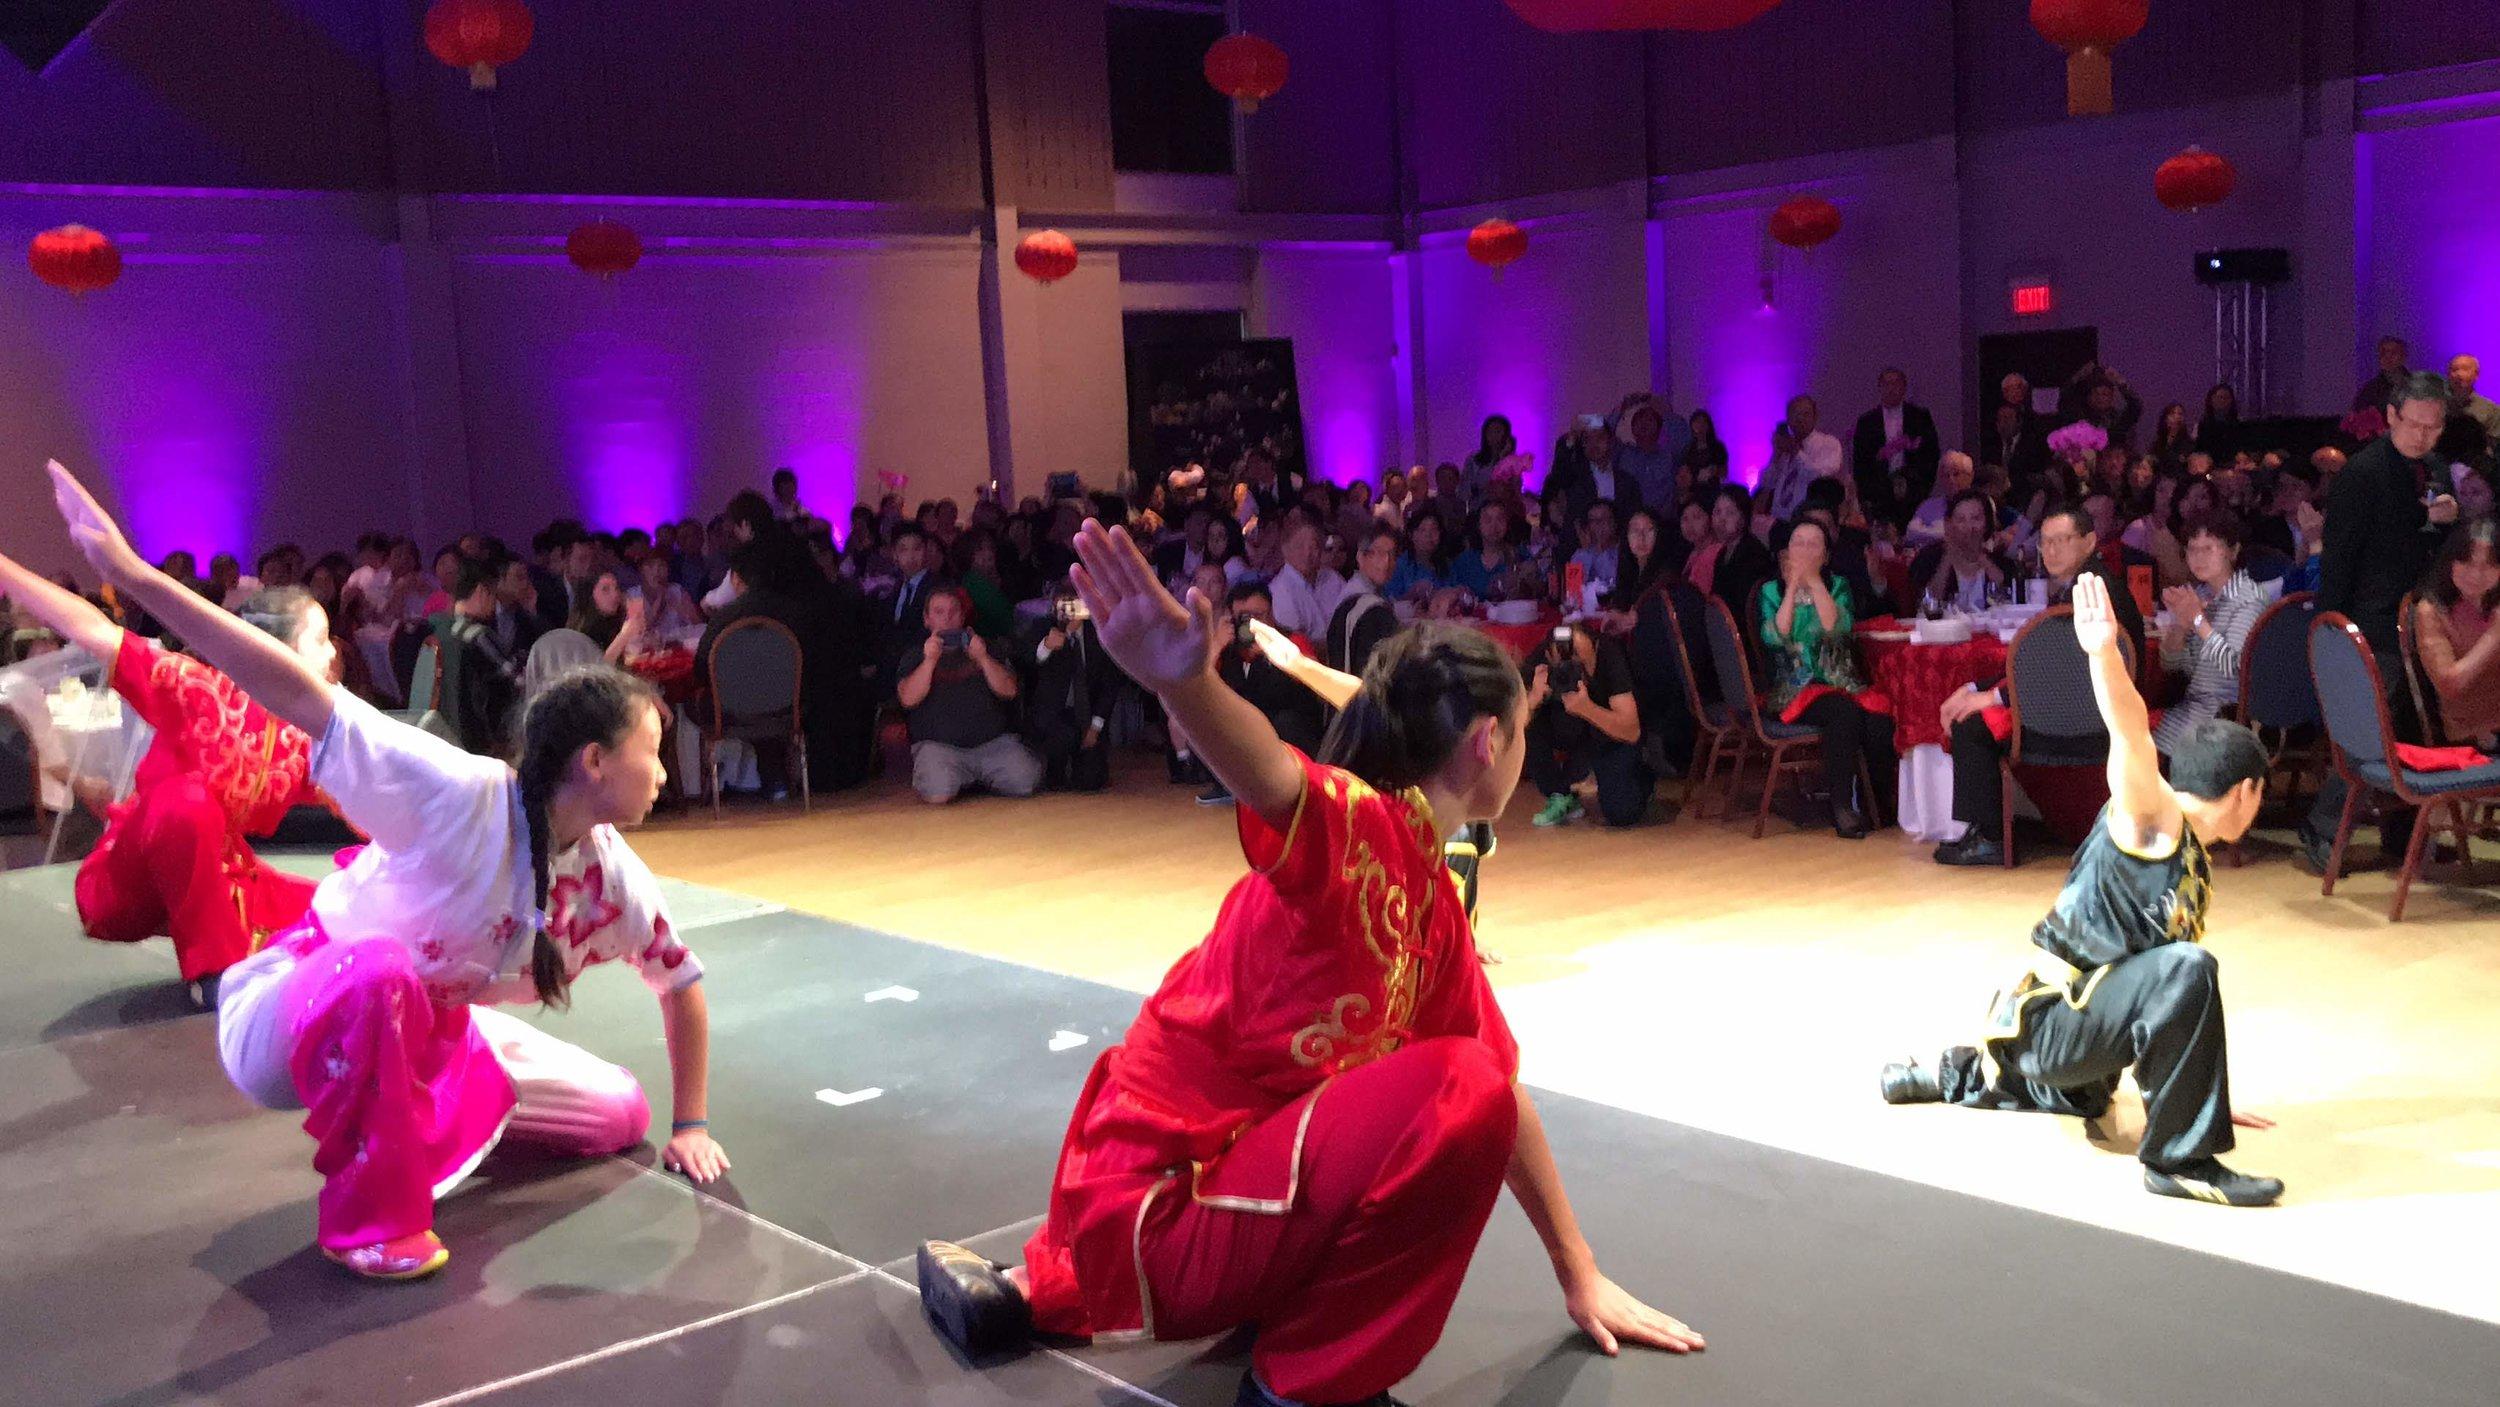 wayland-li-wushu-prime-minister-justin-trudeau-demo-midautumn-festival-2018-06.jpg